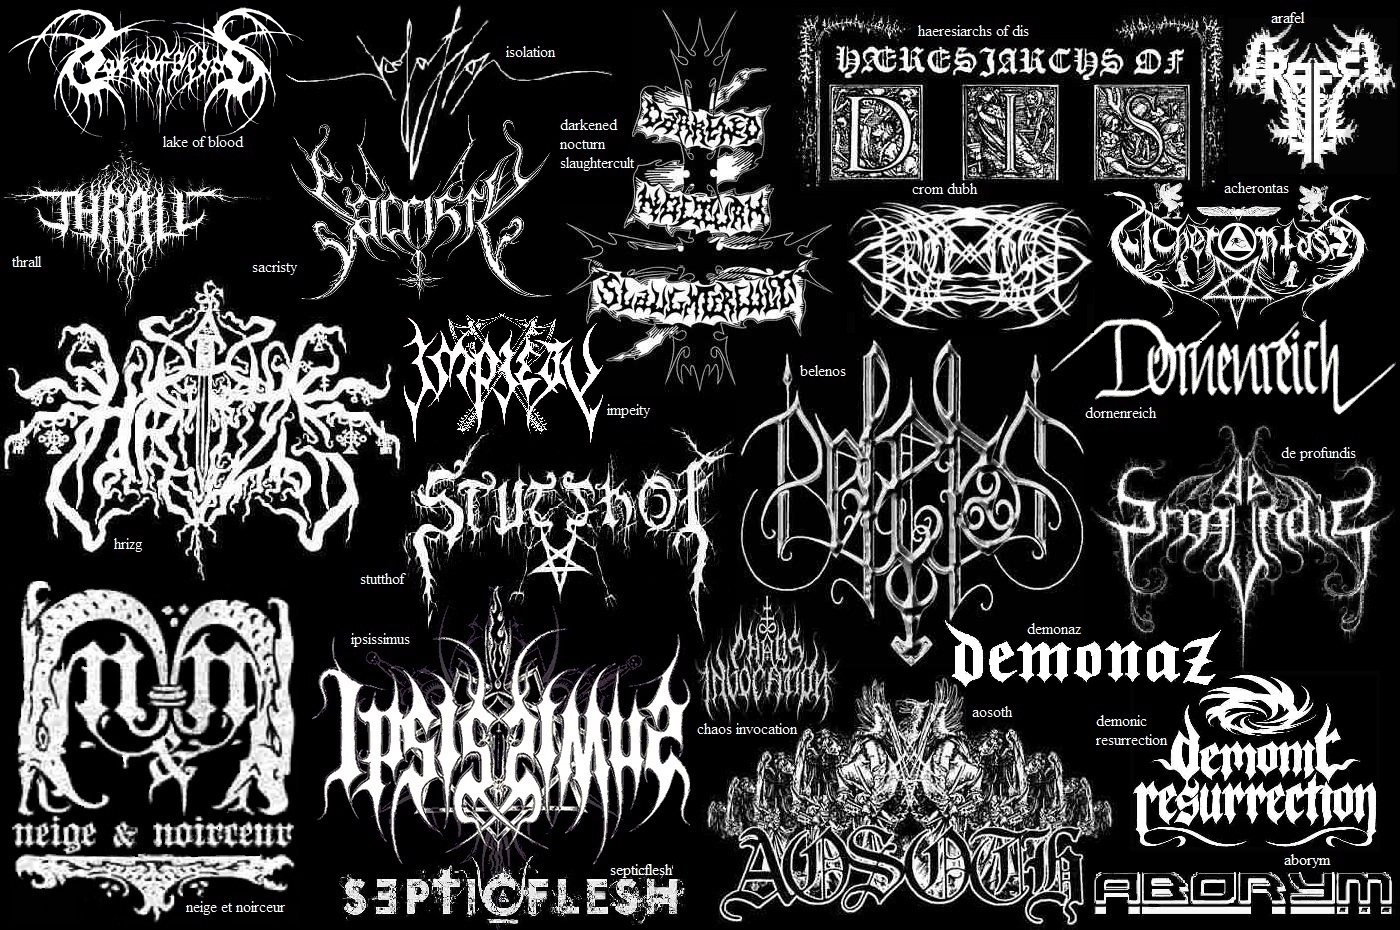 May the devil take us...: Black Metal Band Logos [Part II]